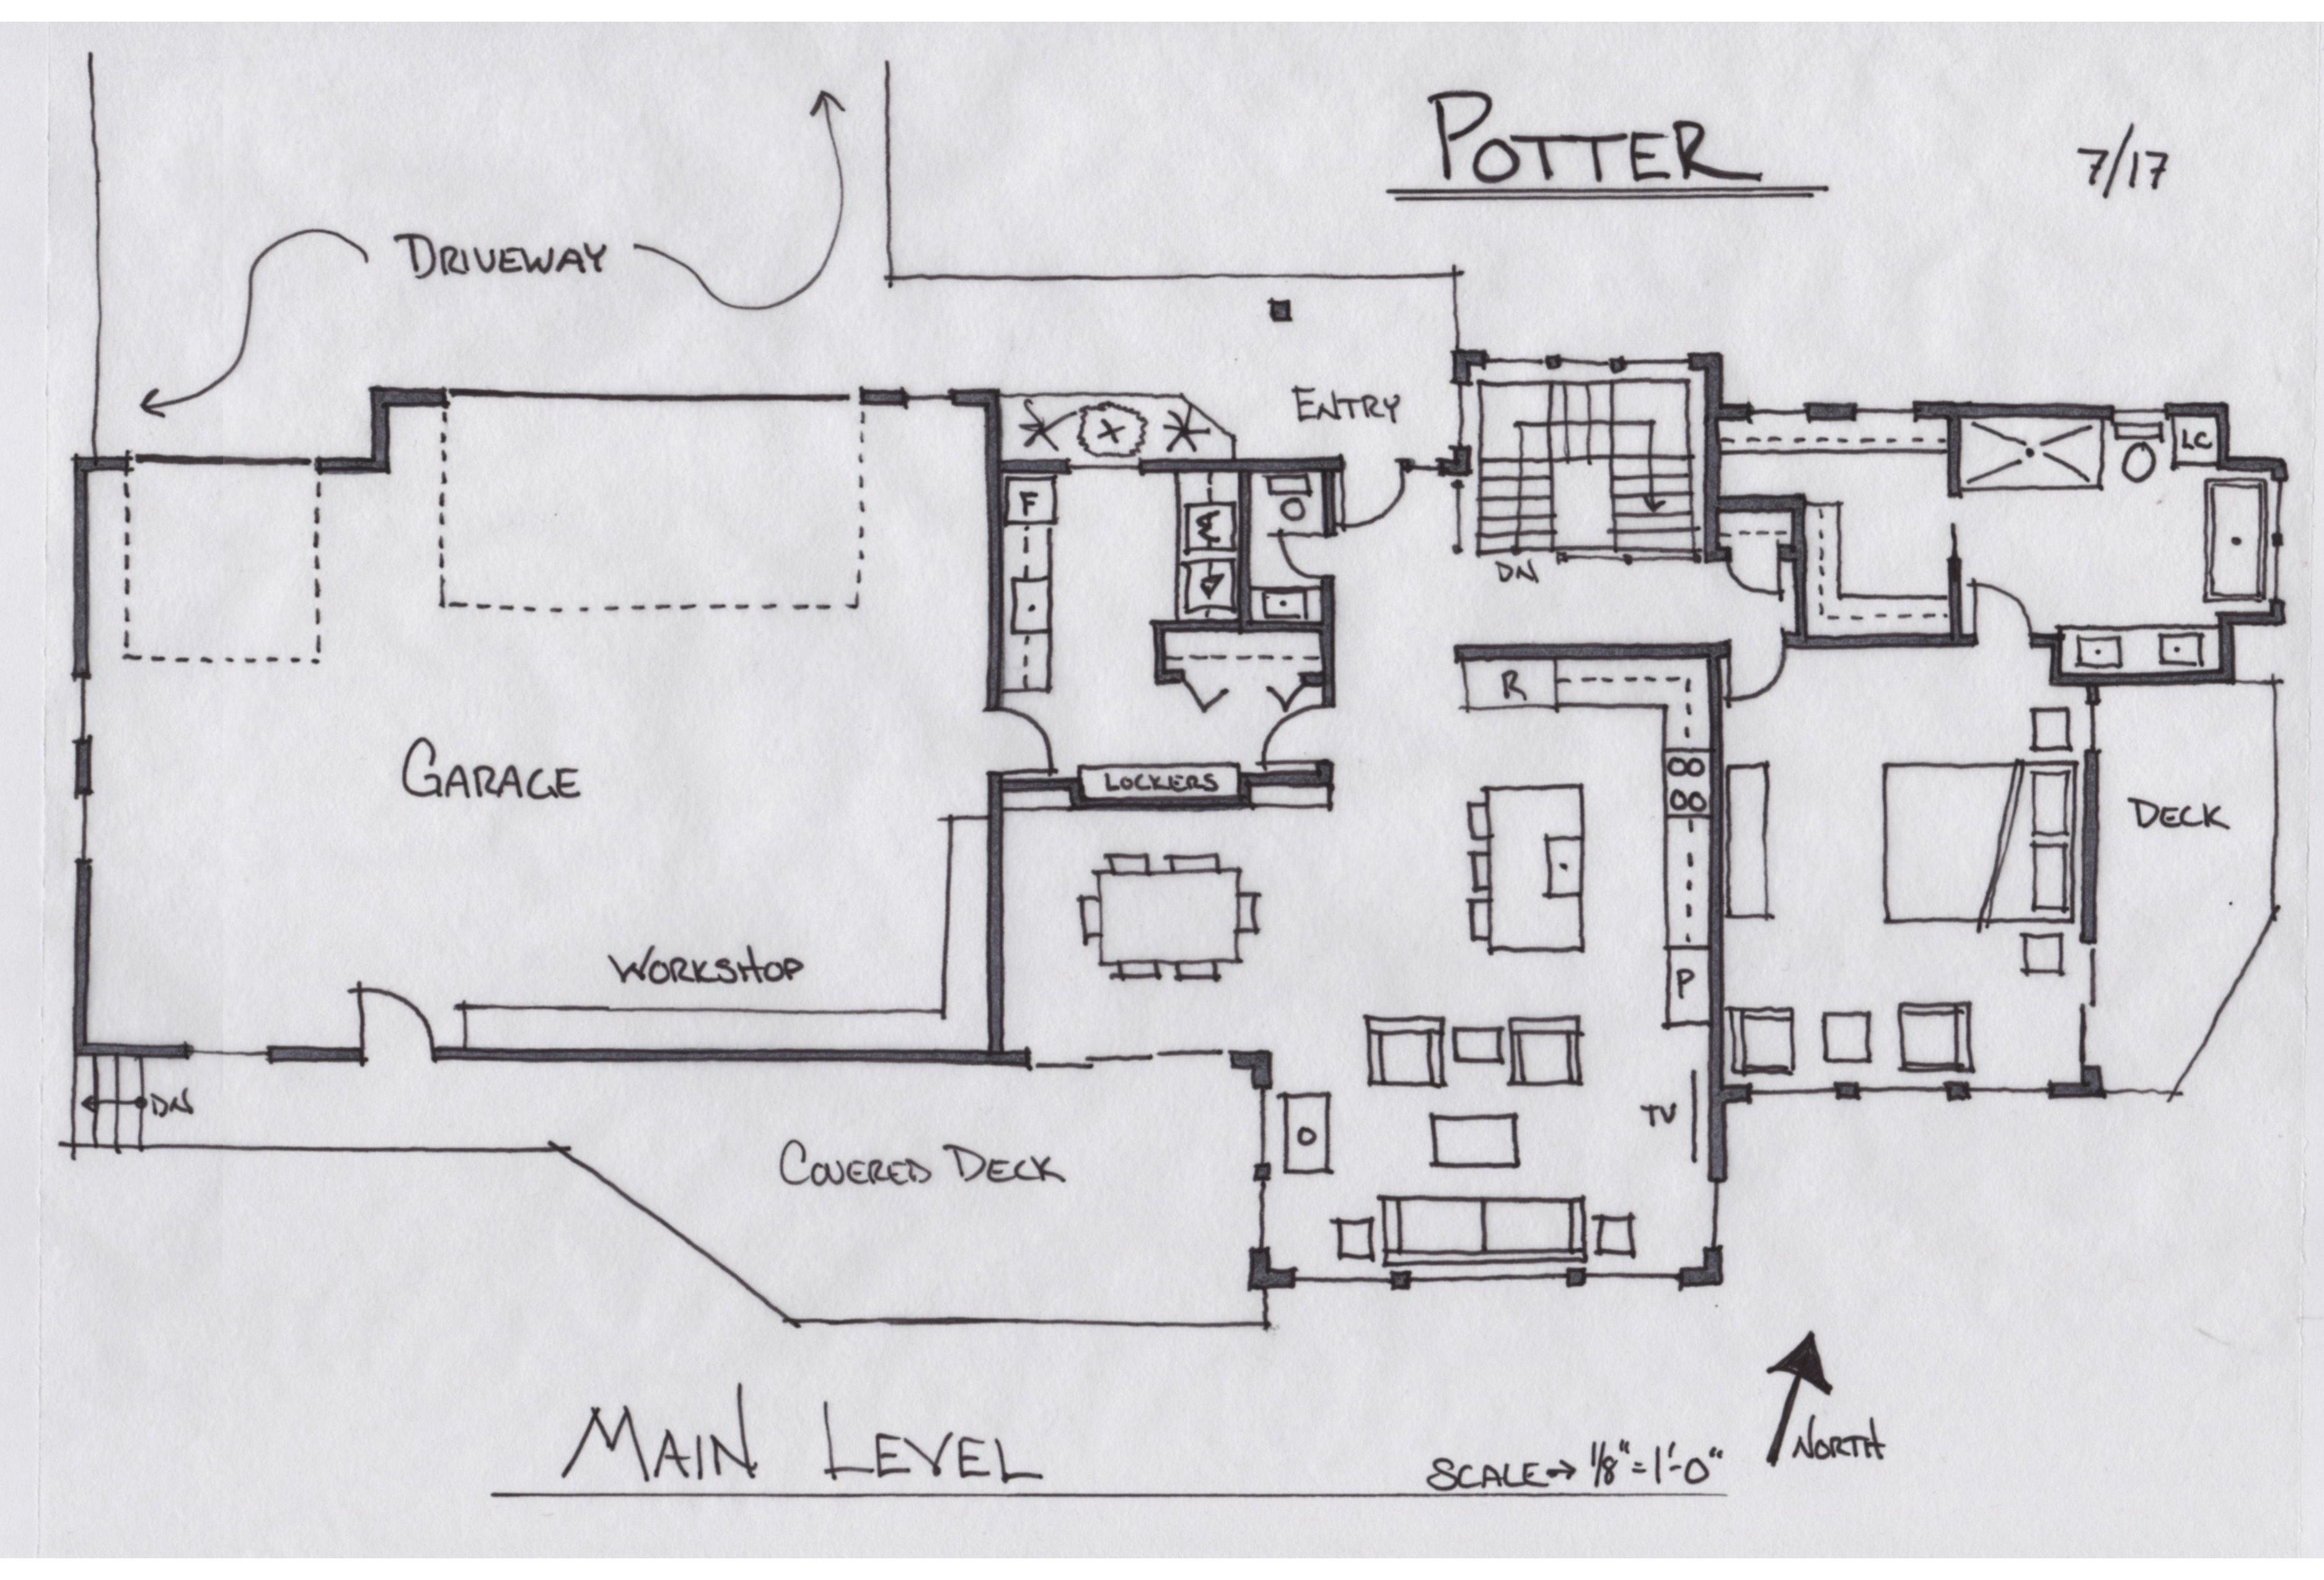 Potter Residence